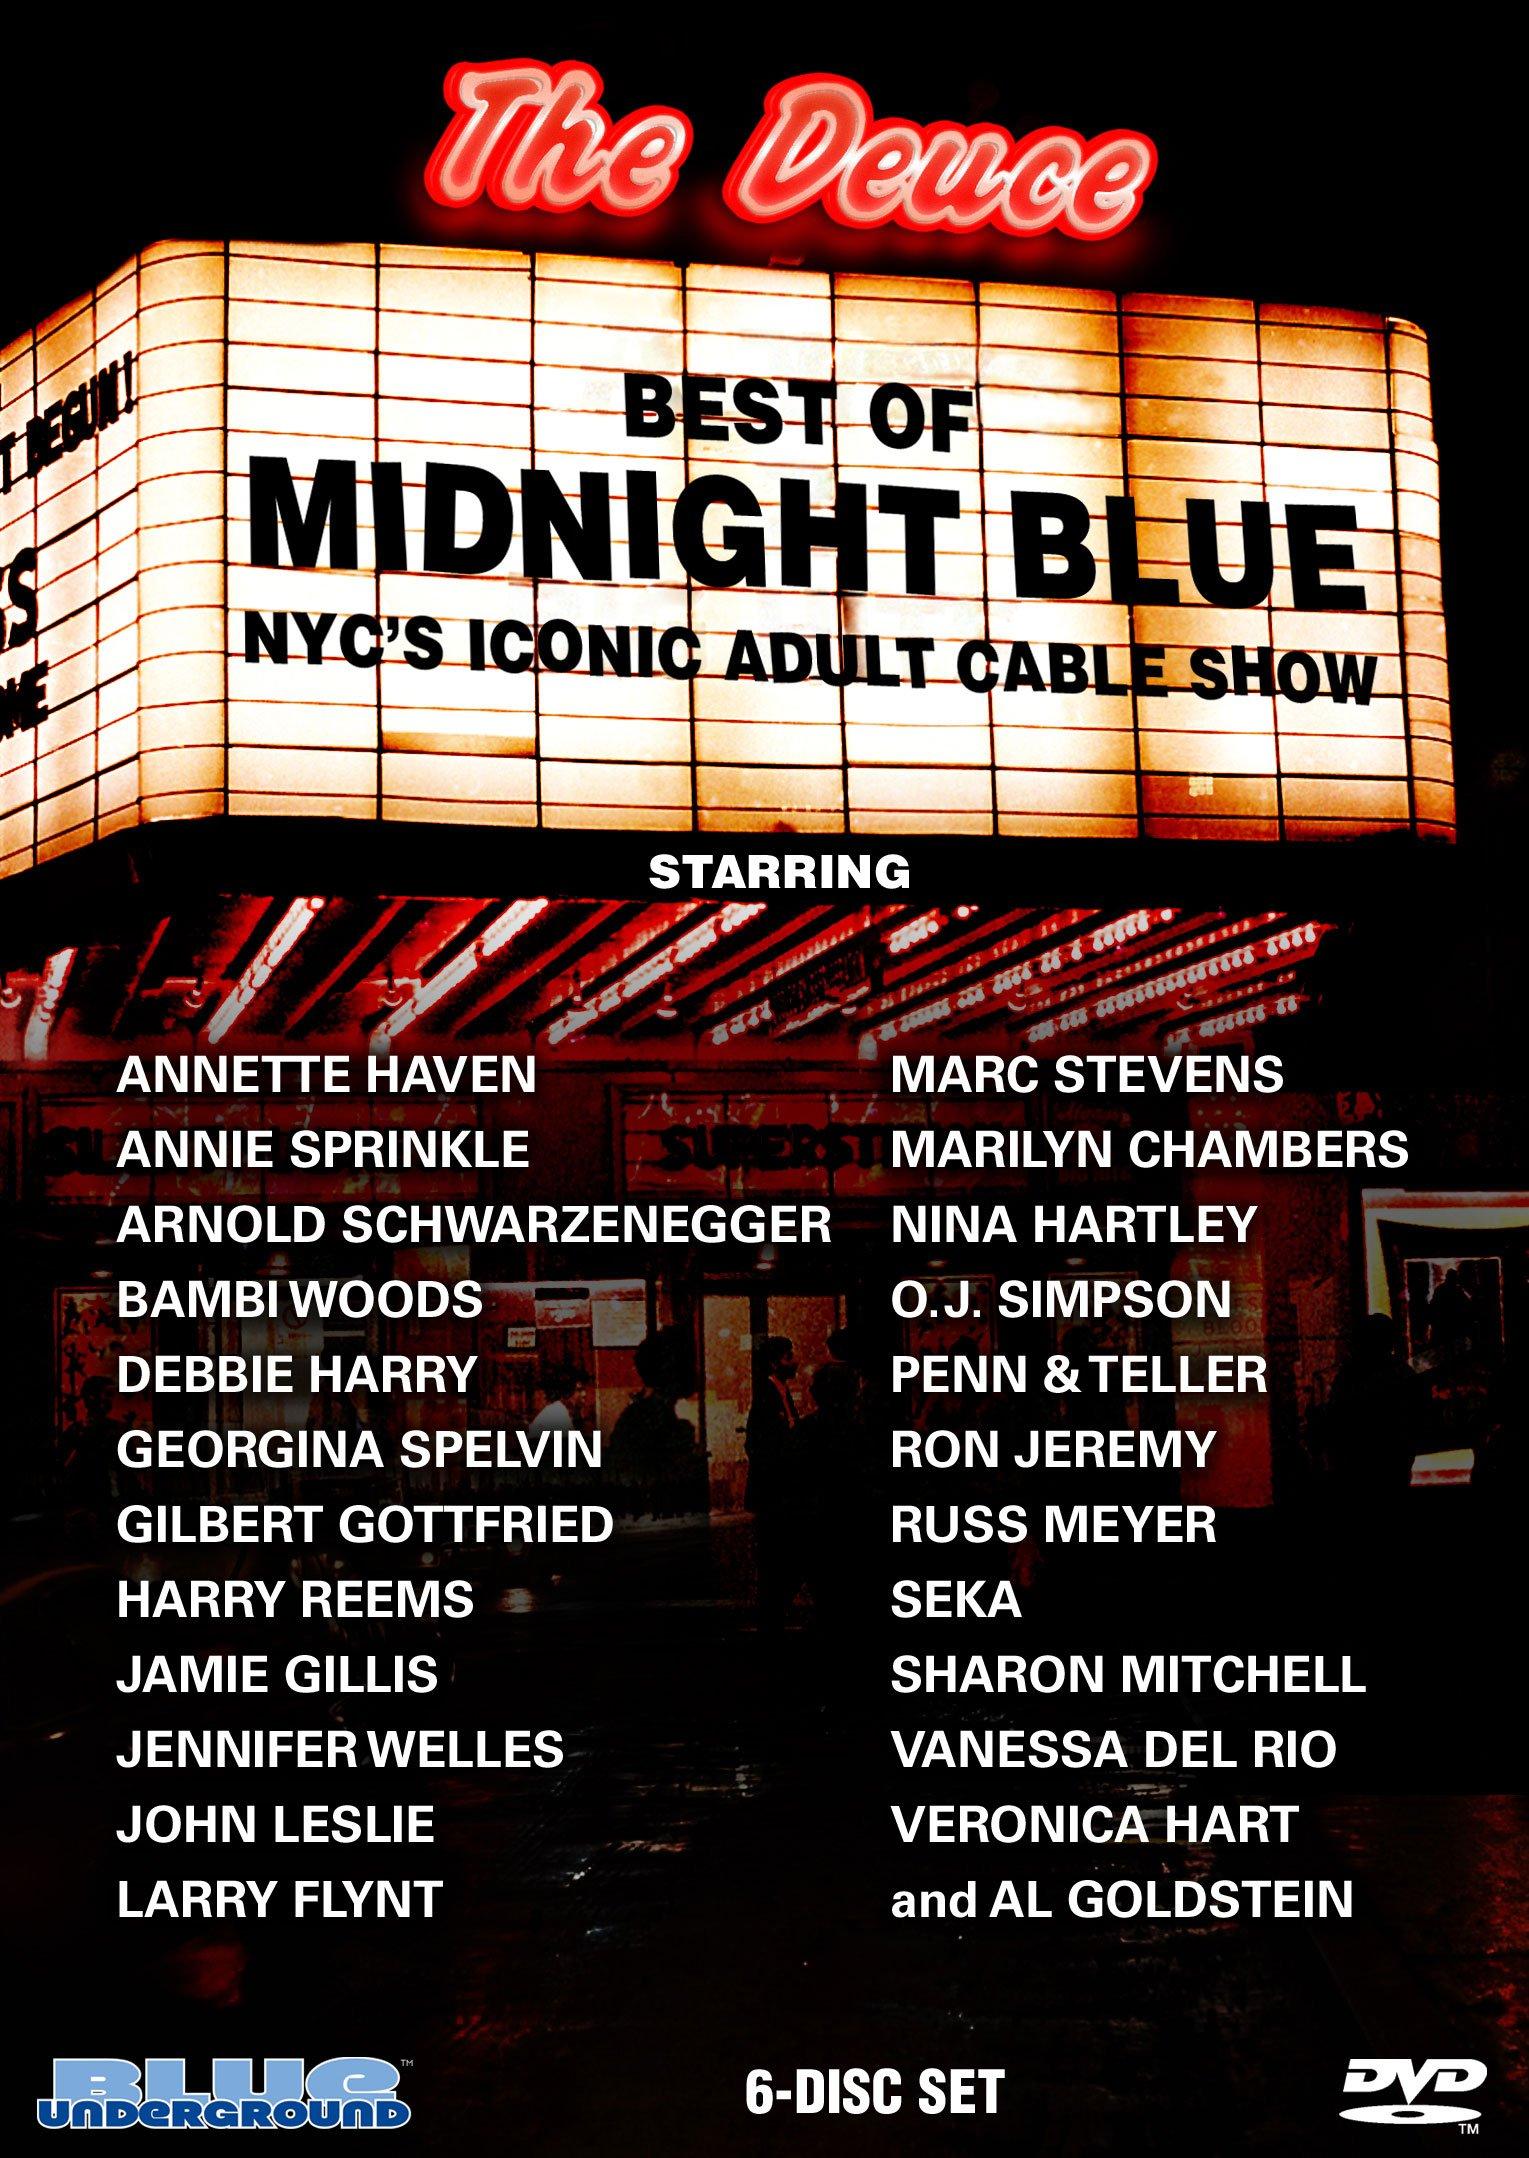 Best Of Midnight Blue (6-Disc Set)